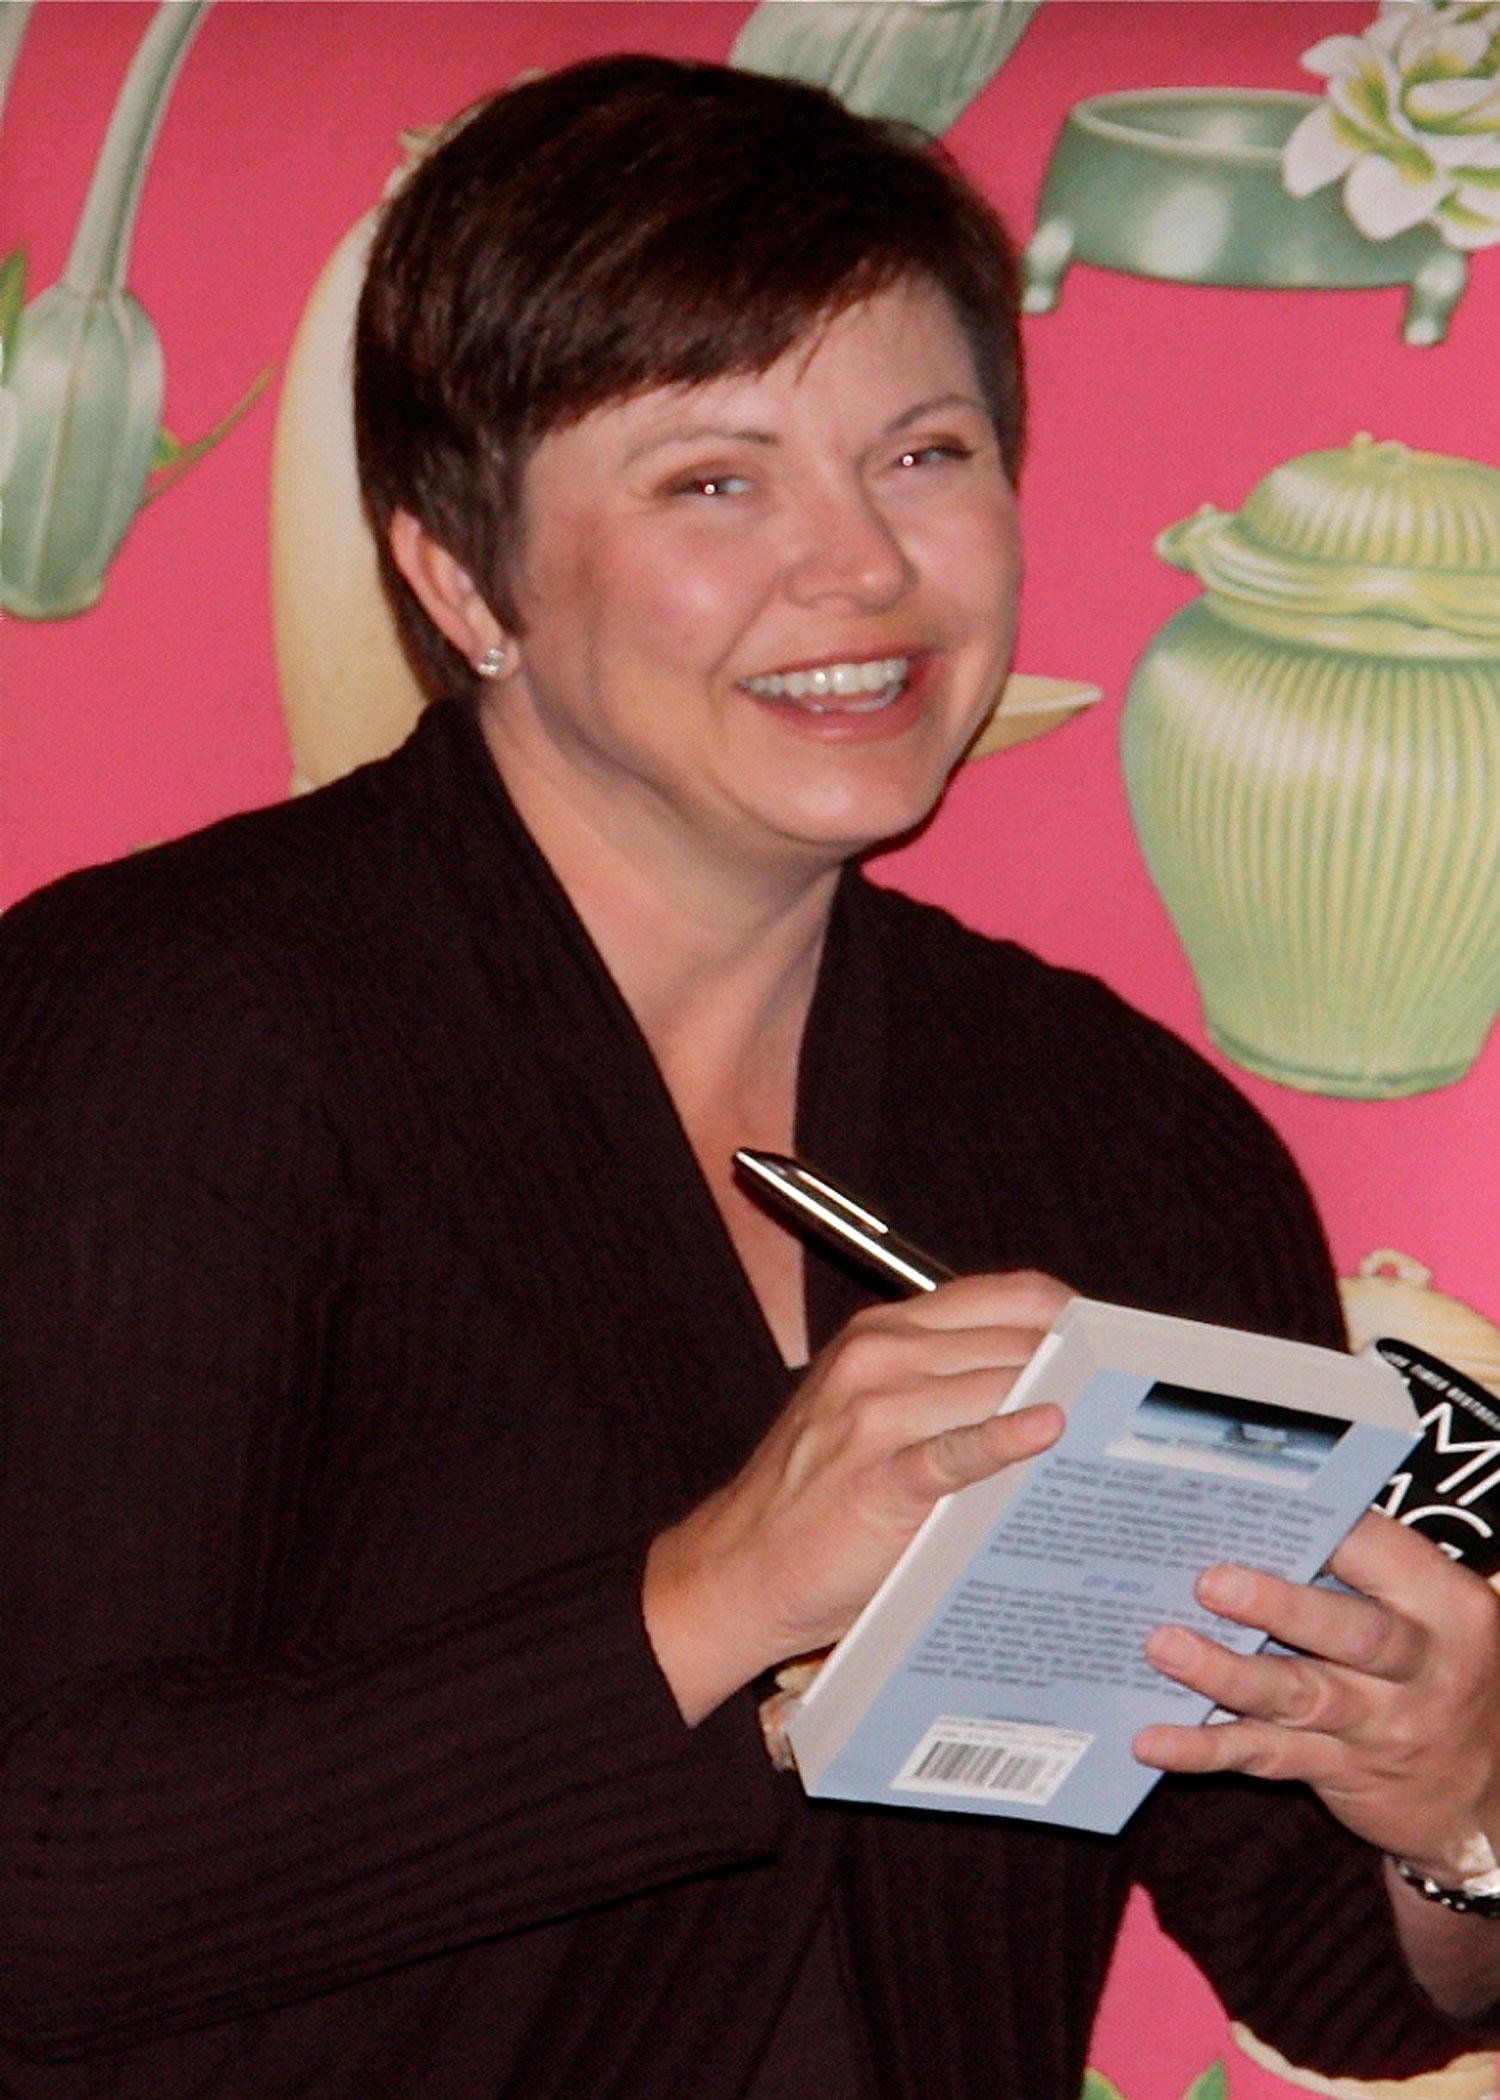 Tami Hoag Book Signing